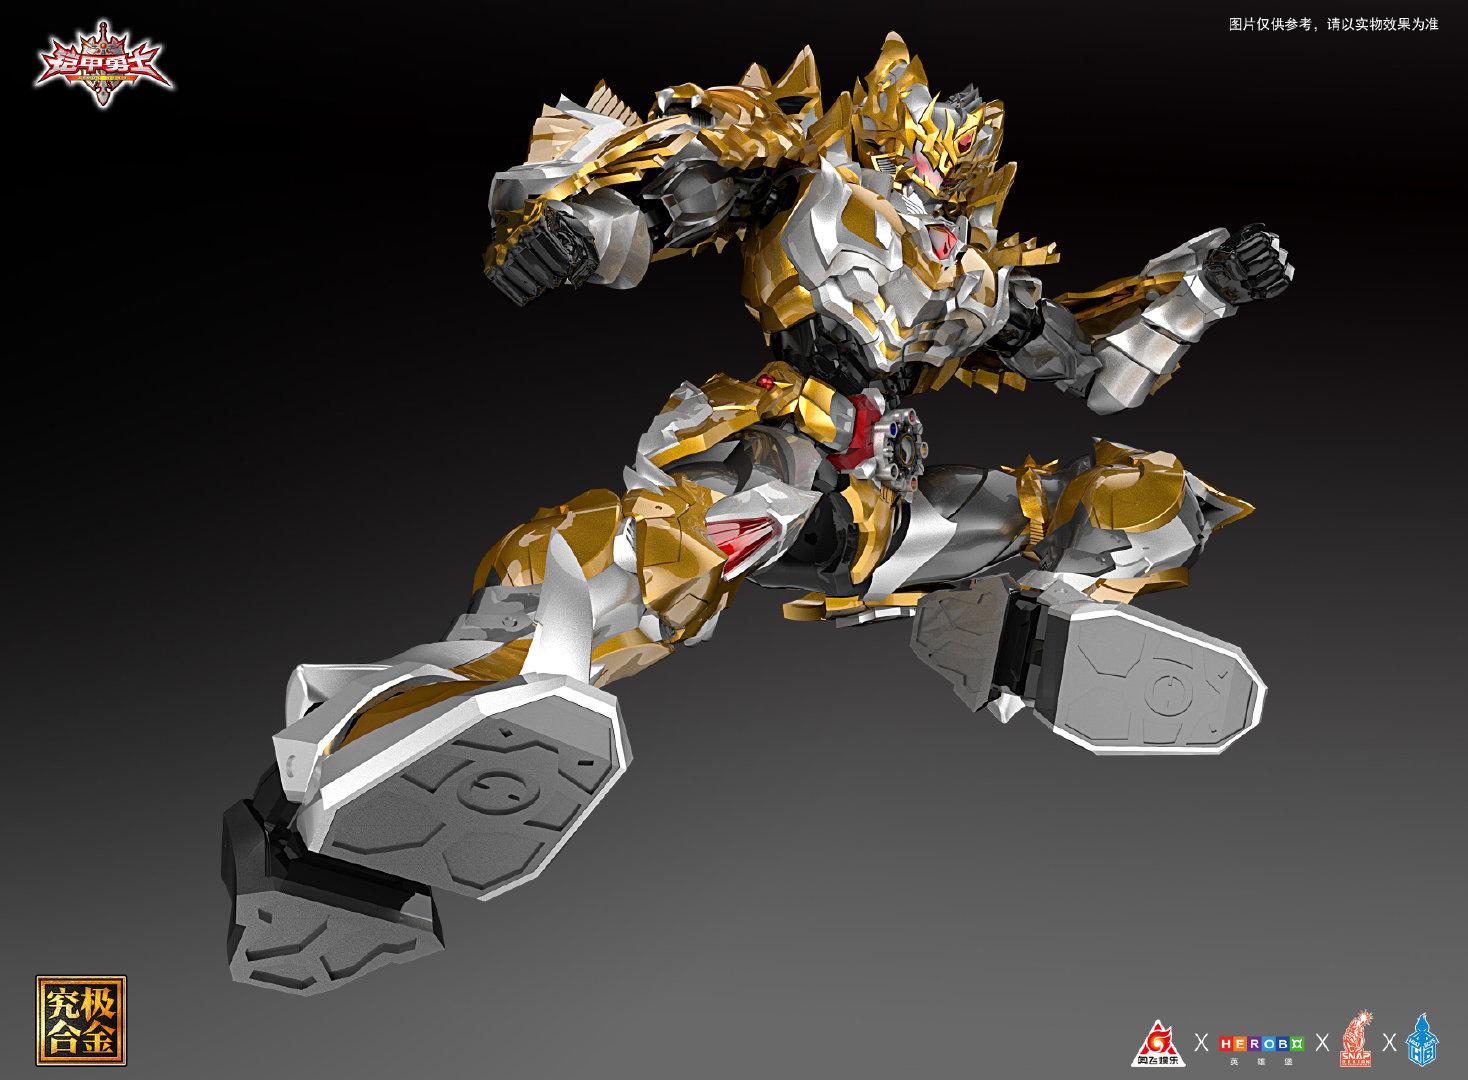 S535_Armor_hero_Emperor_036.jpg